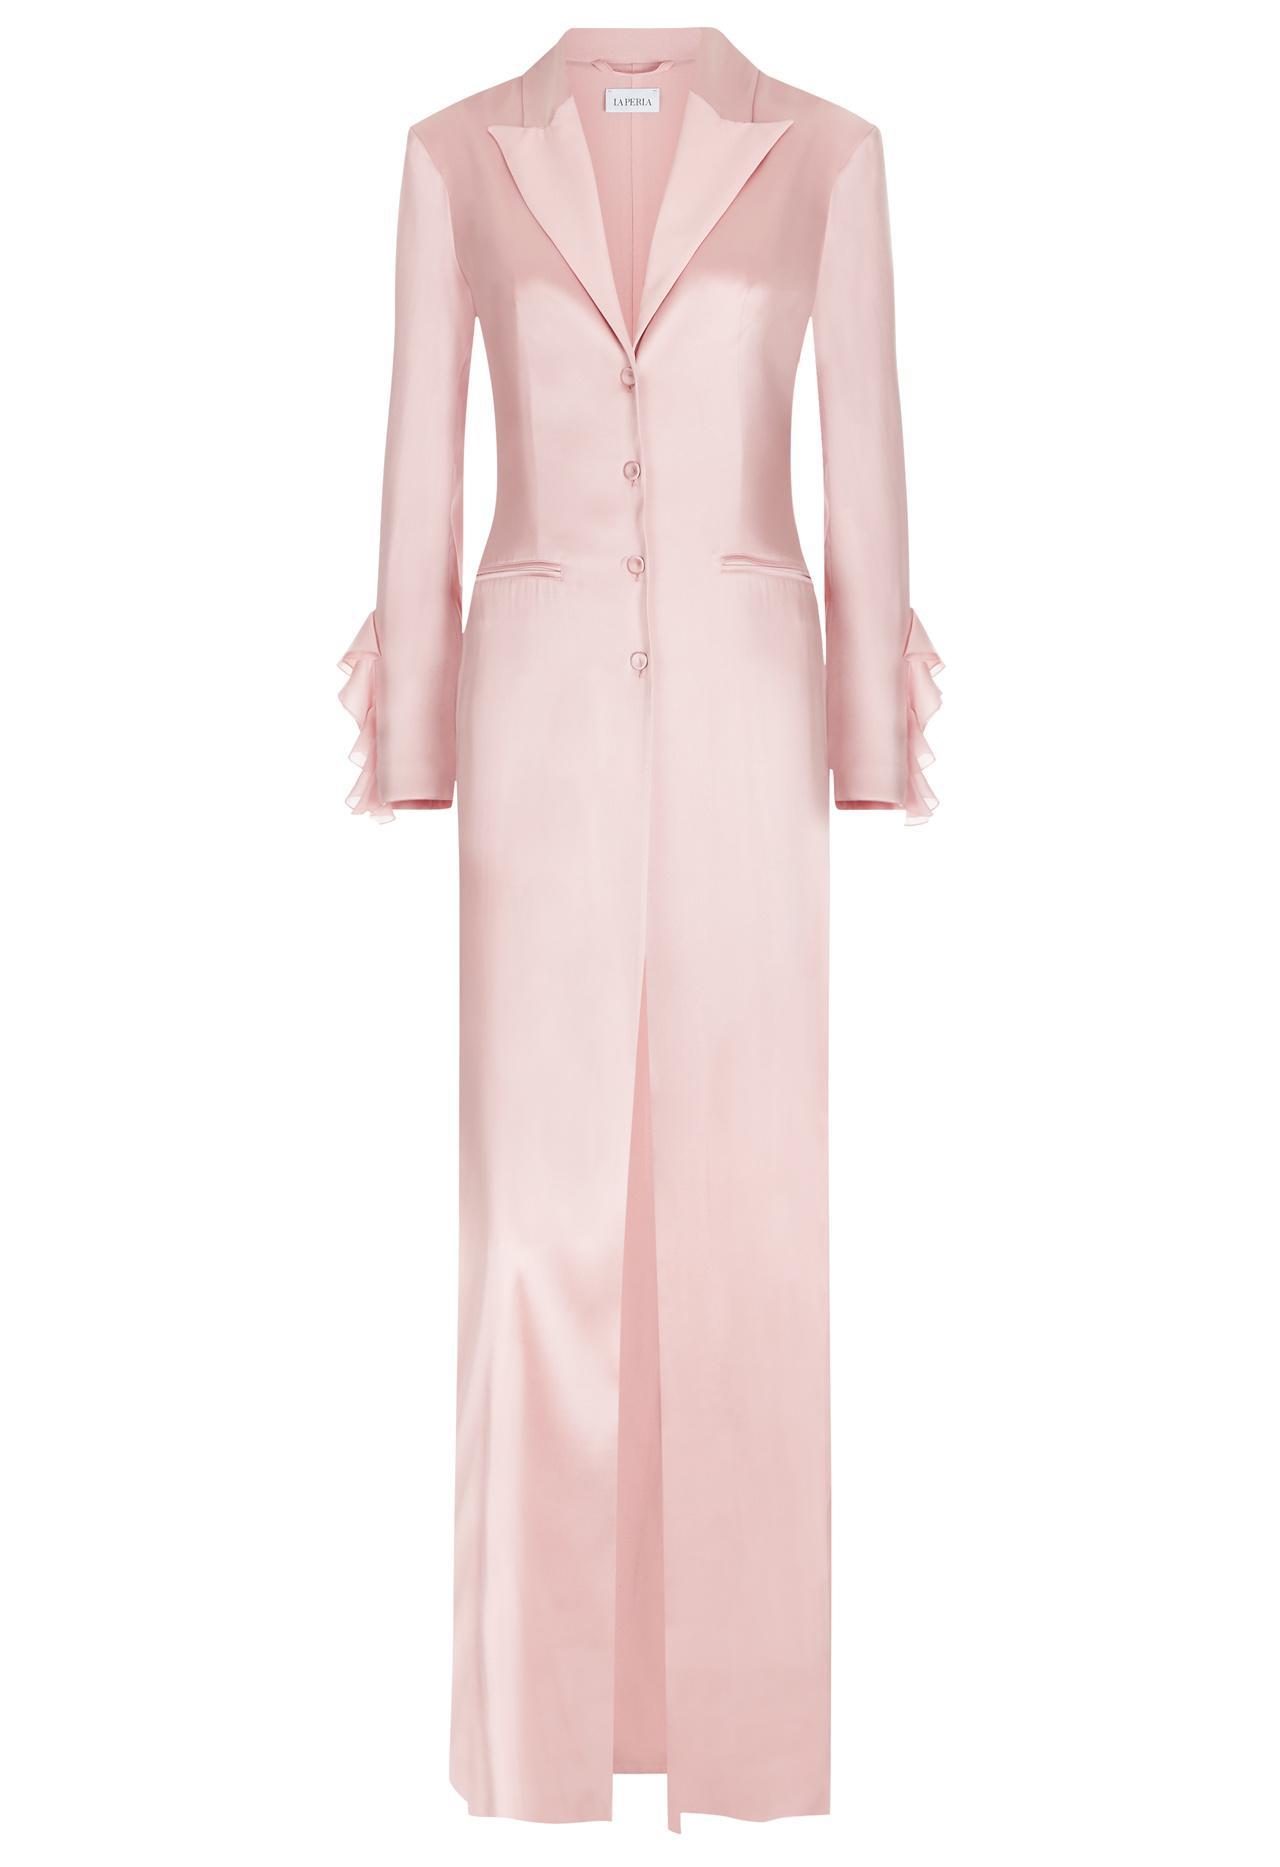 2b322a39d La perla Powder Pink Silk Satin Long Robe With Georgette Ruffle Trim ...